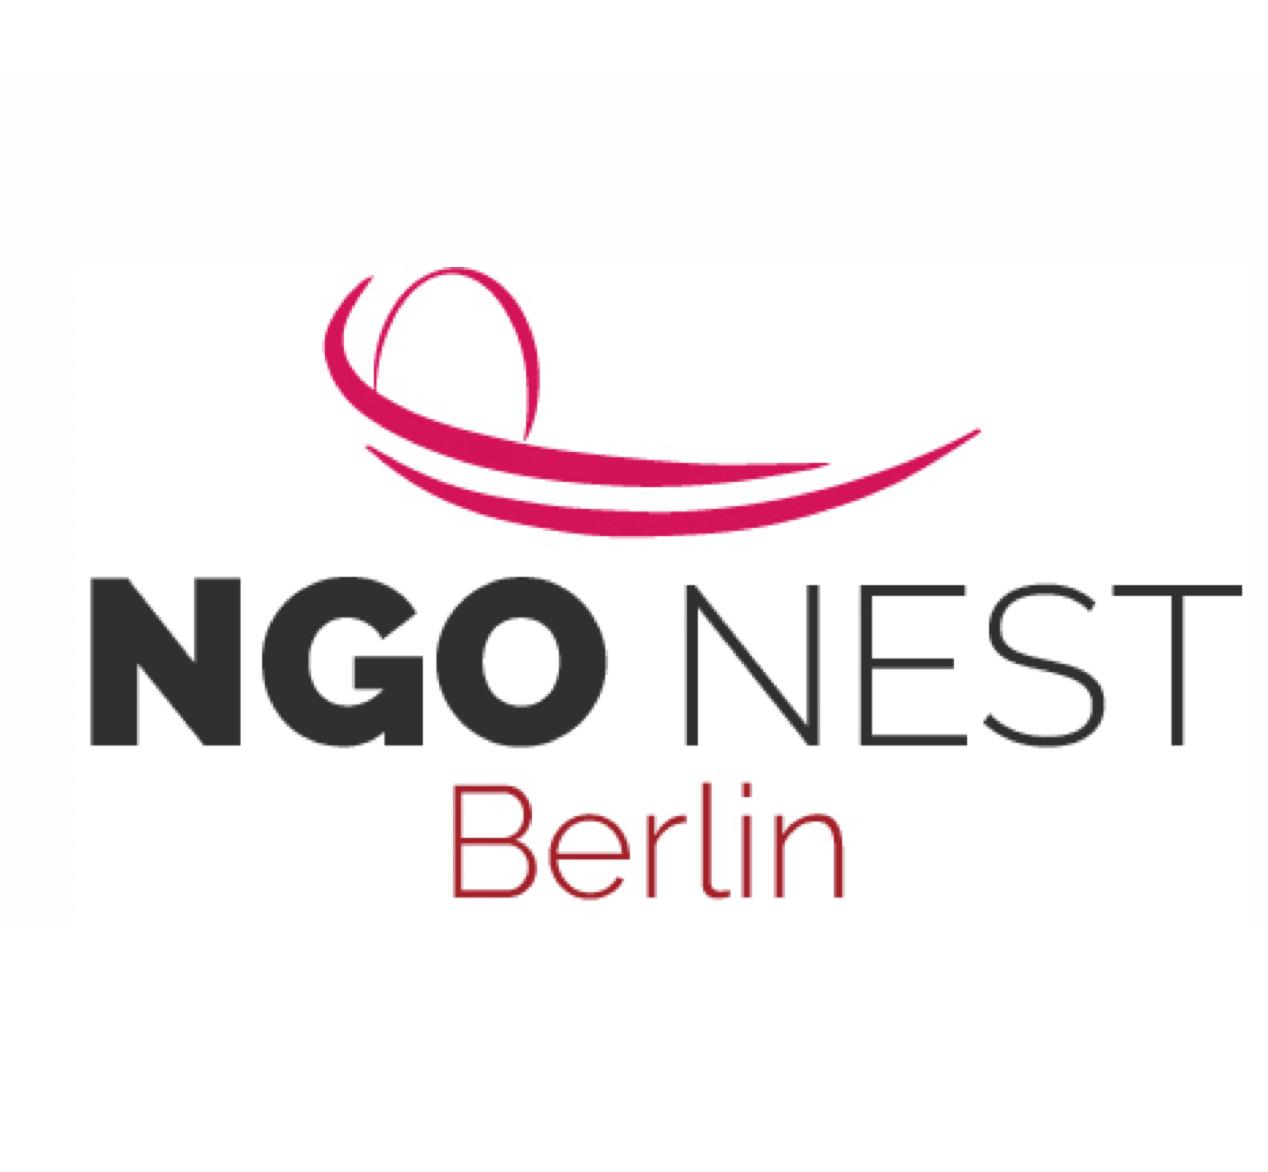 NGO Nest Berlin